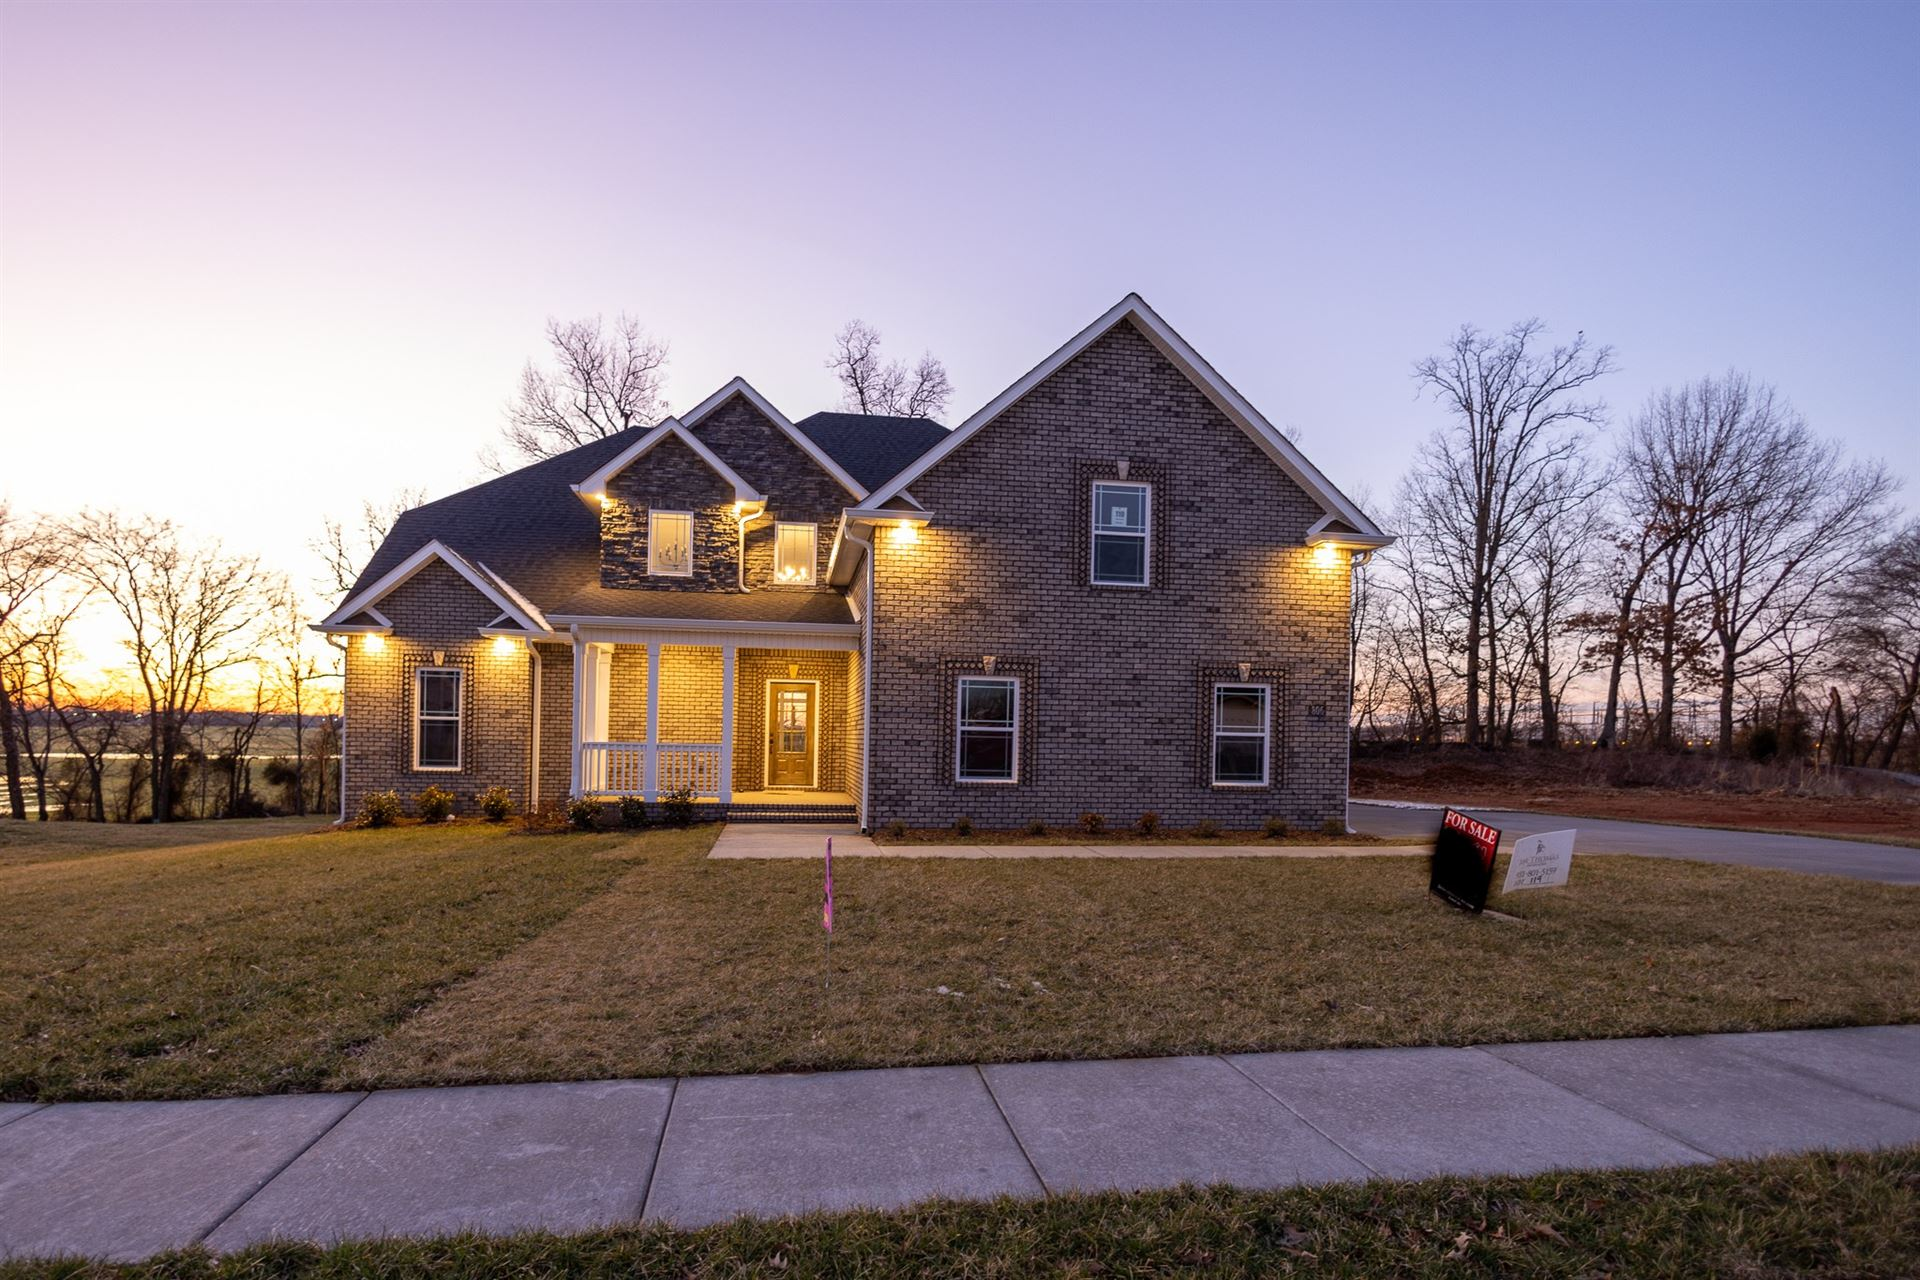 119 Hartley Hills, Clarksville, TN 37043 - MLS#: 2275466